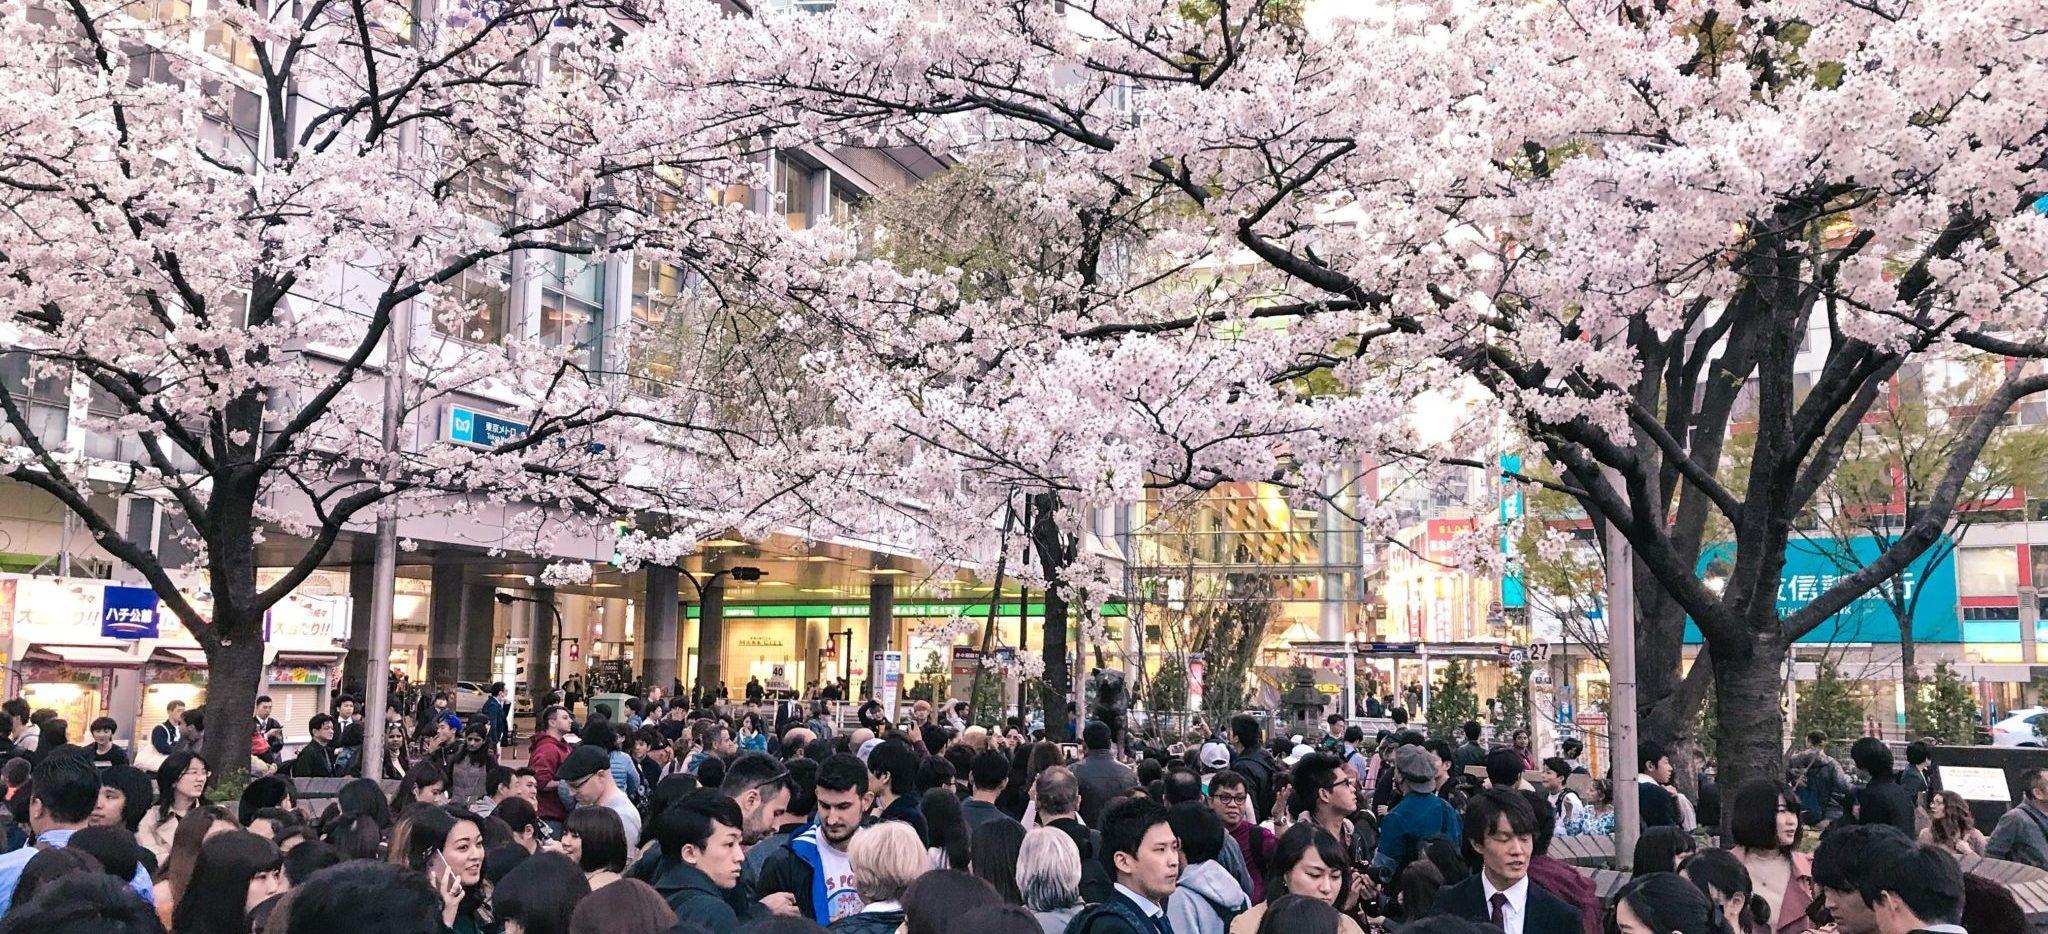 Cherry blossom spots in Tokyo